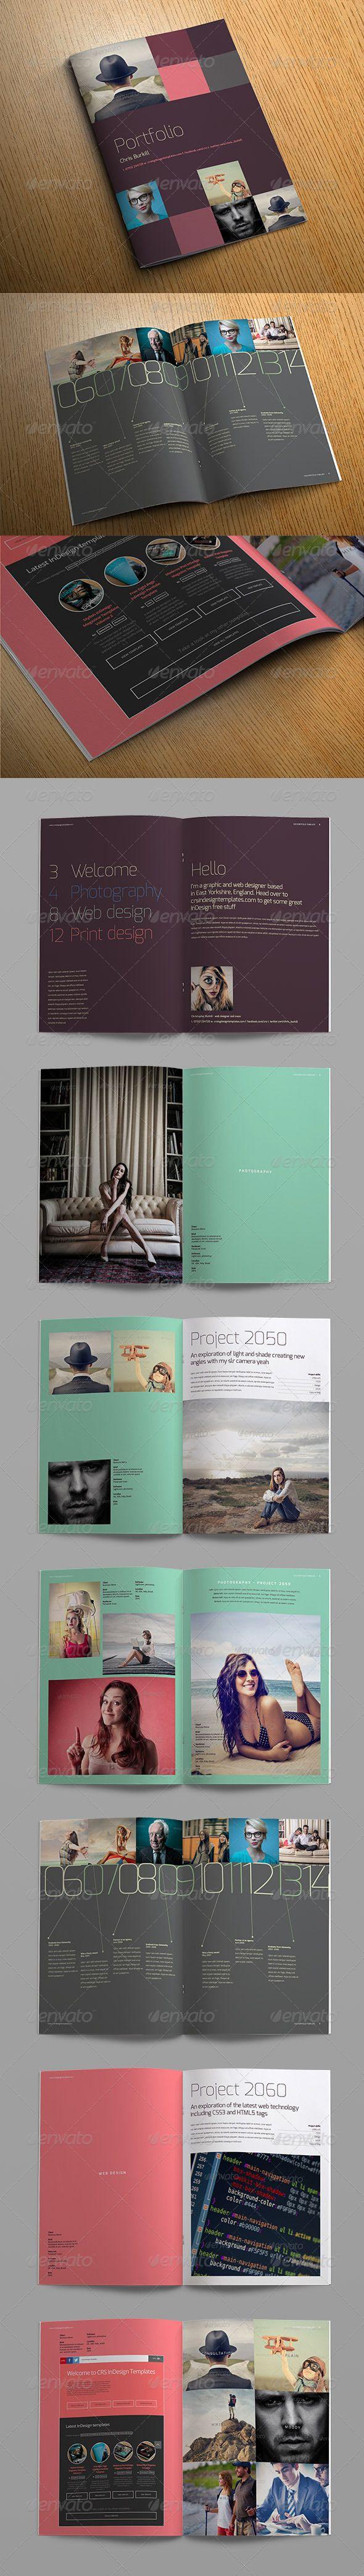 Exo Portfolio Template - #Photo #Albums Print #Templates Download here: https://graphicriver.net/item/exo-portfolio-template/7742833?ref=alena994